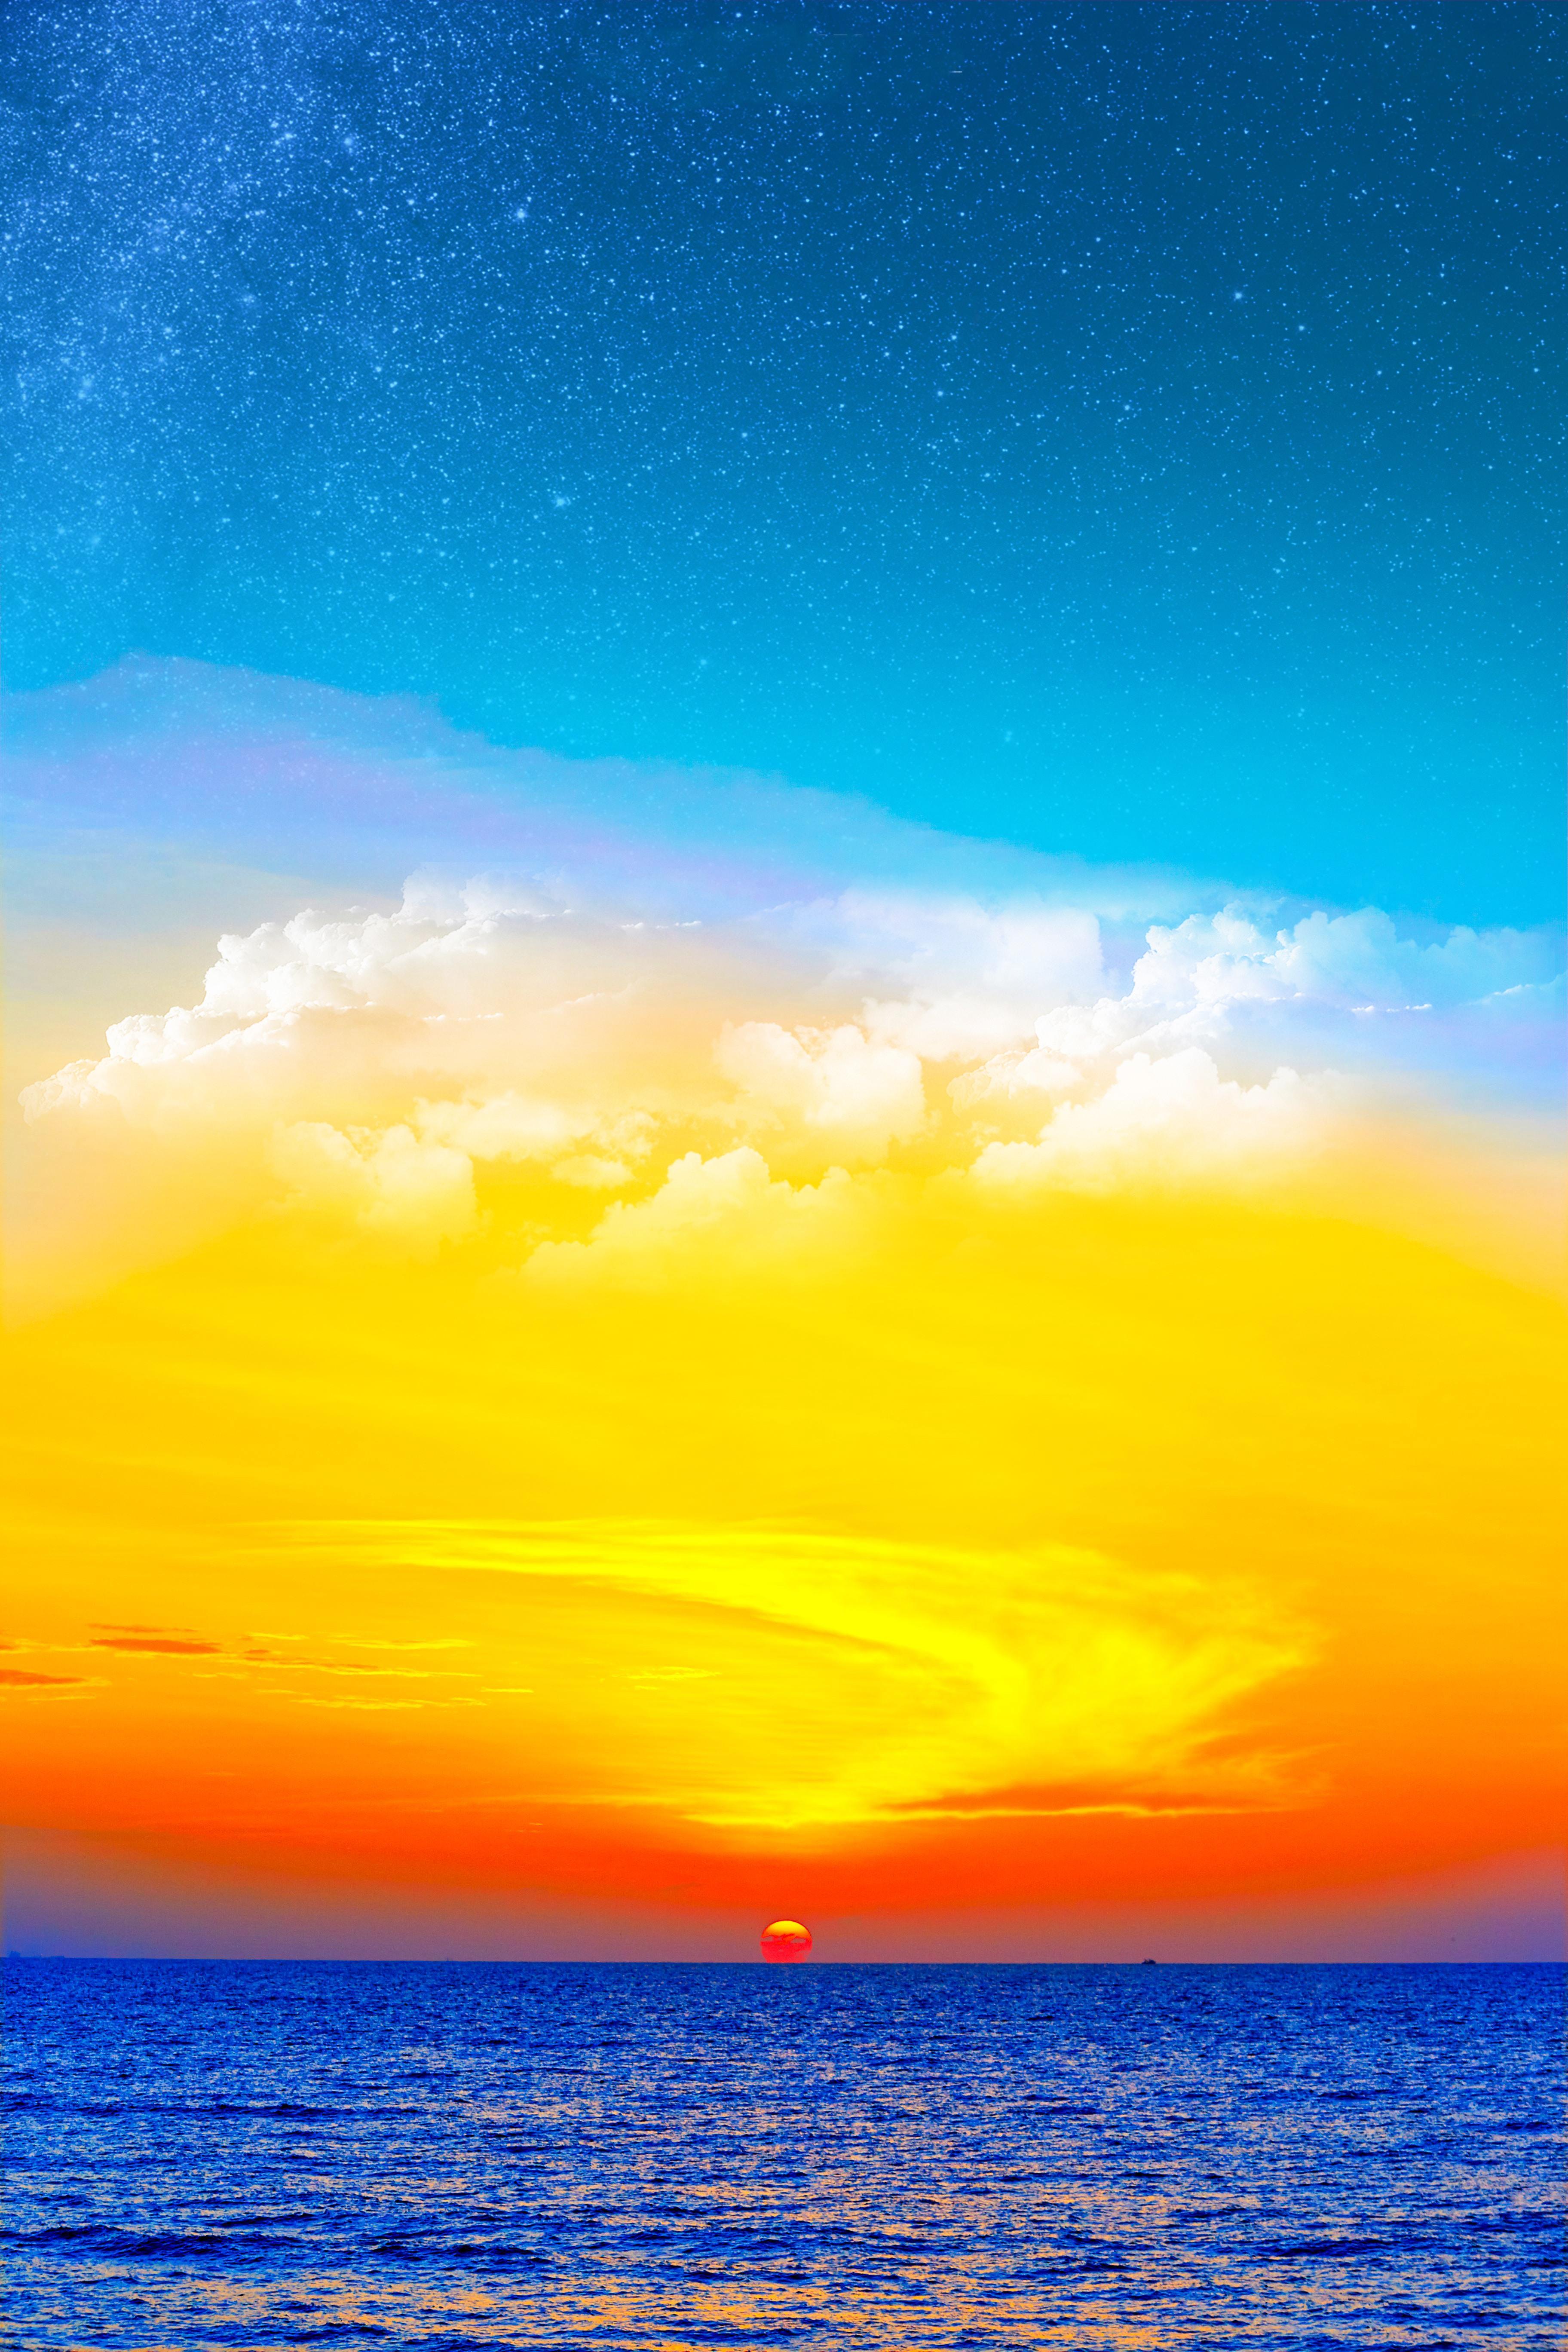 blue sea under blue, white, and orange sky during sunset digital wallpaper